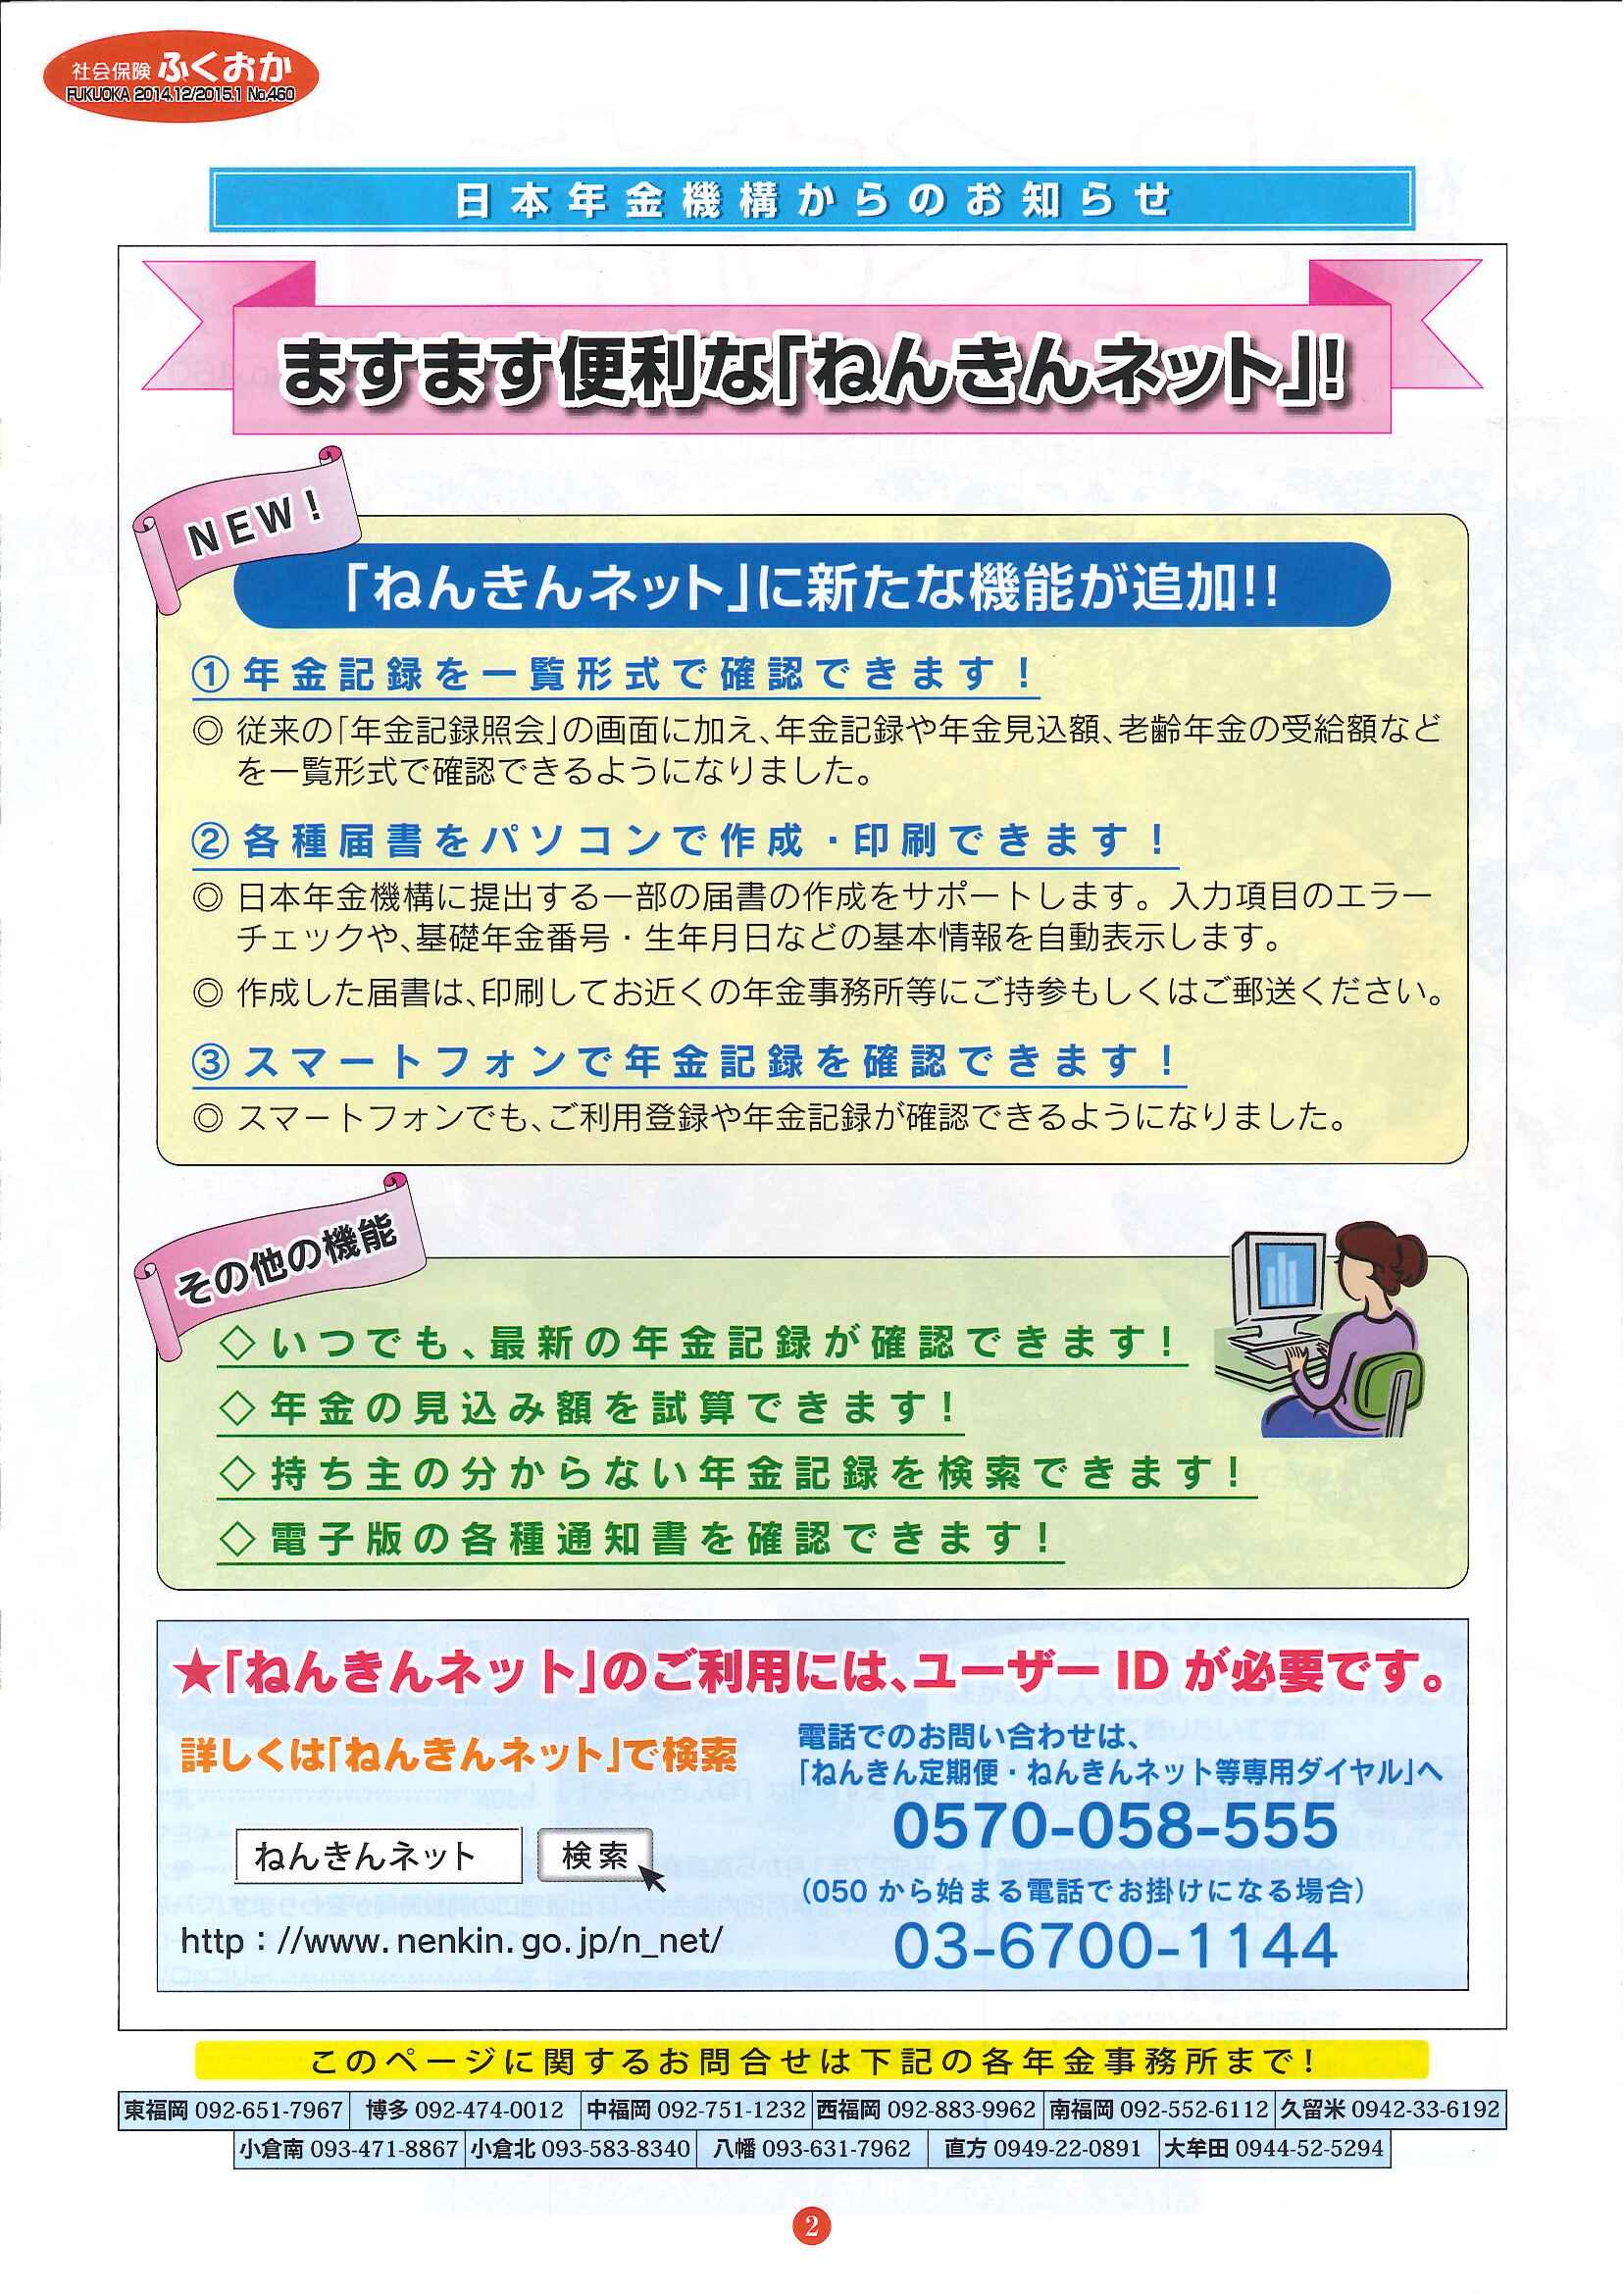 H27年1月予定/社会保険「ふくおか」/年末年始事務局休み_f0120774_1254155.jpg